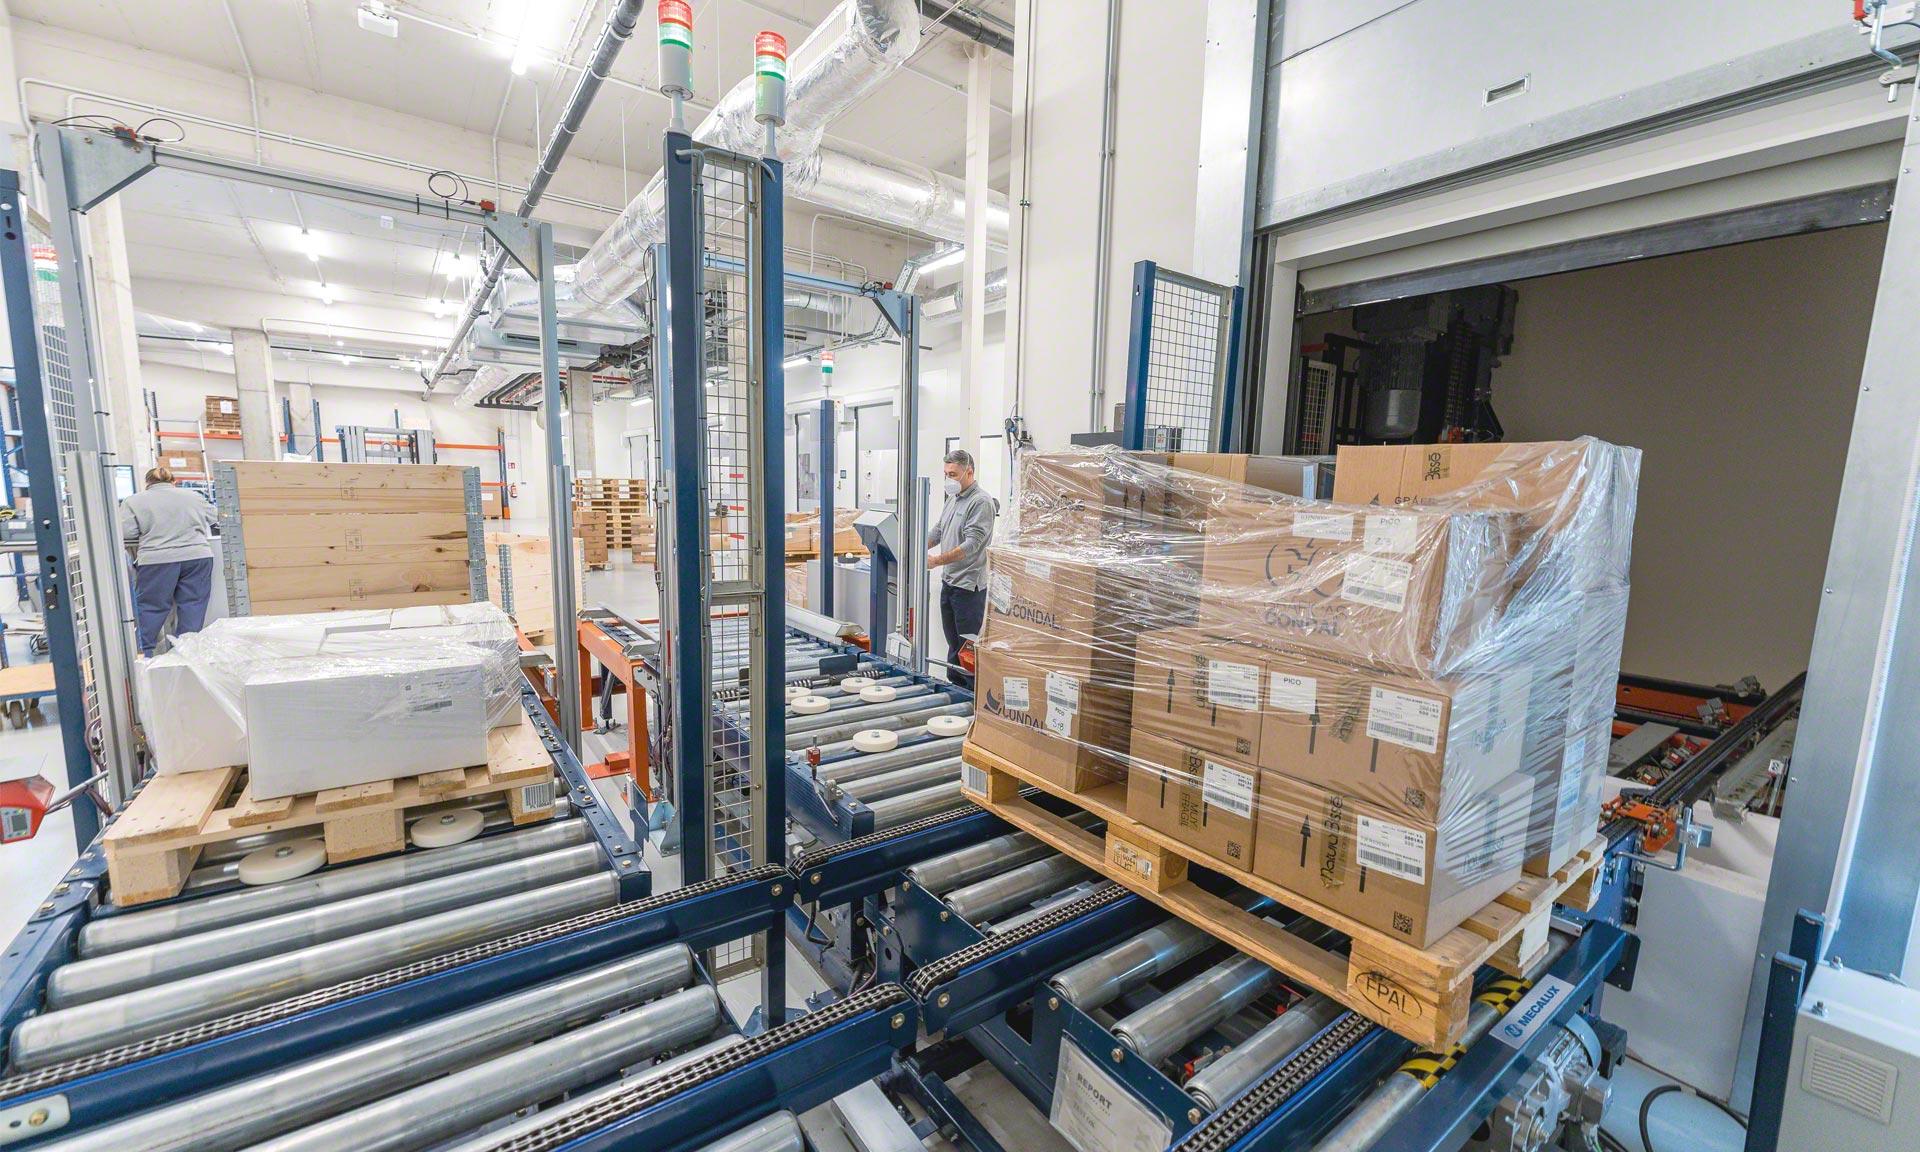 Natura Bissé: an automated warehouse for beautifying logistics